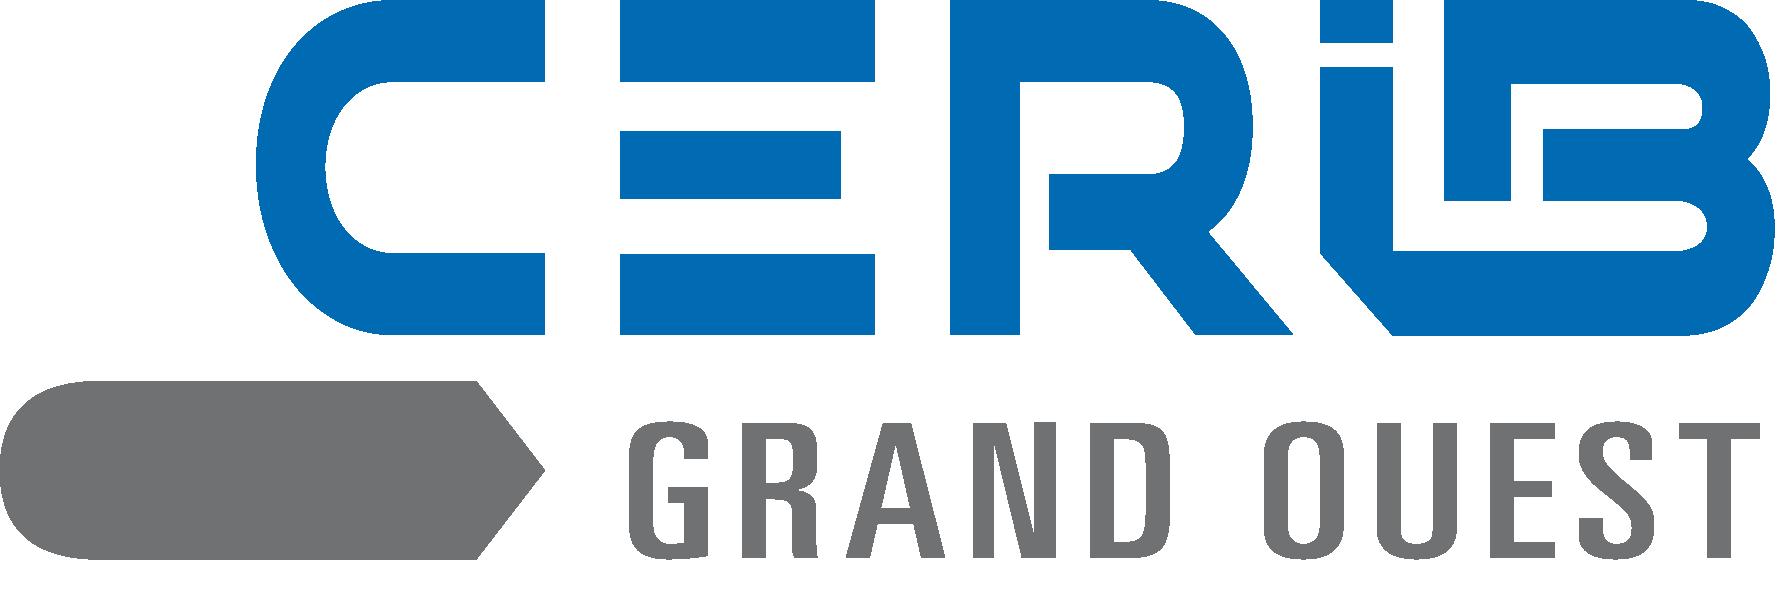 Cerib Logo Grand Ouest 2019 (cmjn)